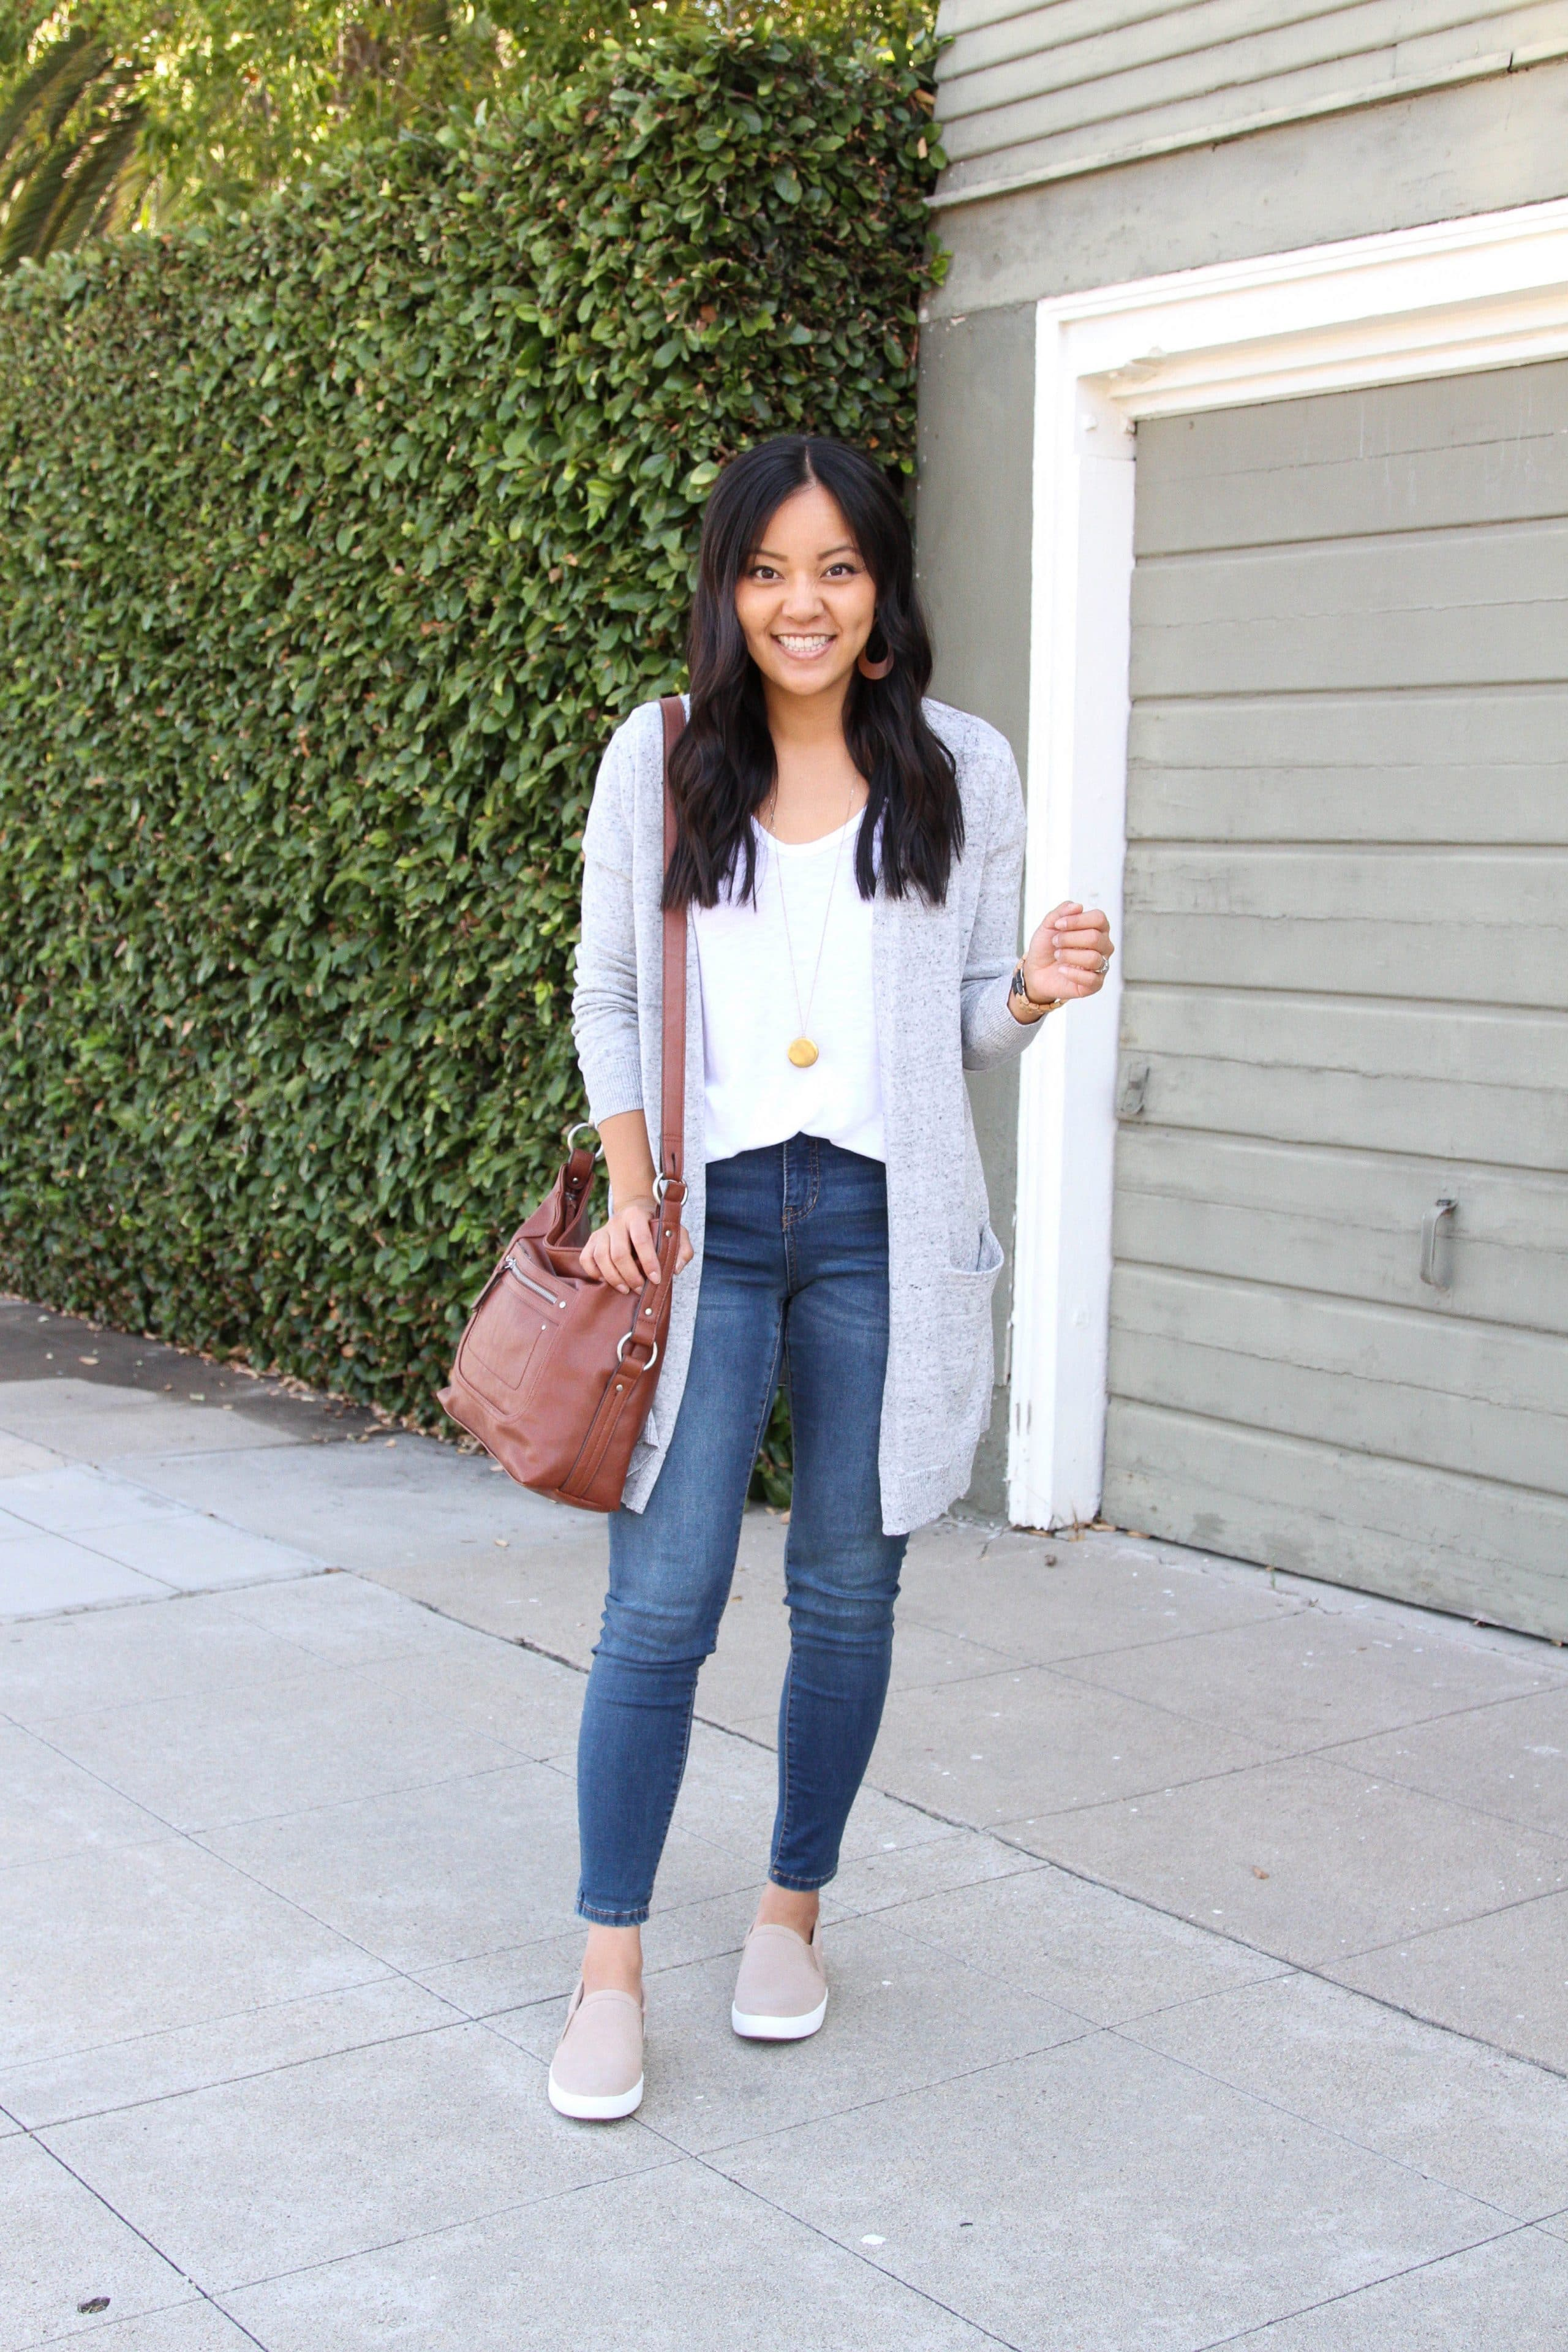 white tee + grey sweater + skinny jeans + tan slip on sneakers + cognac purse